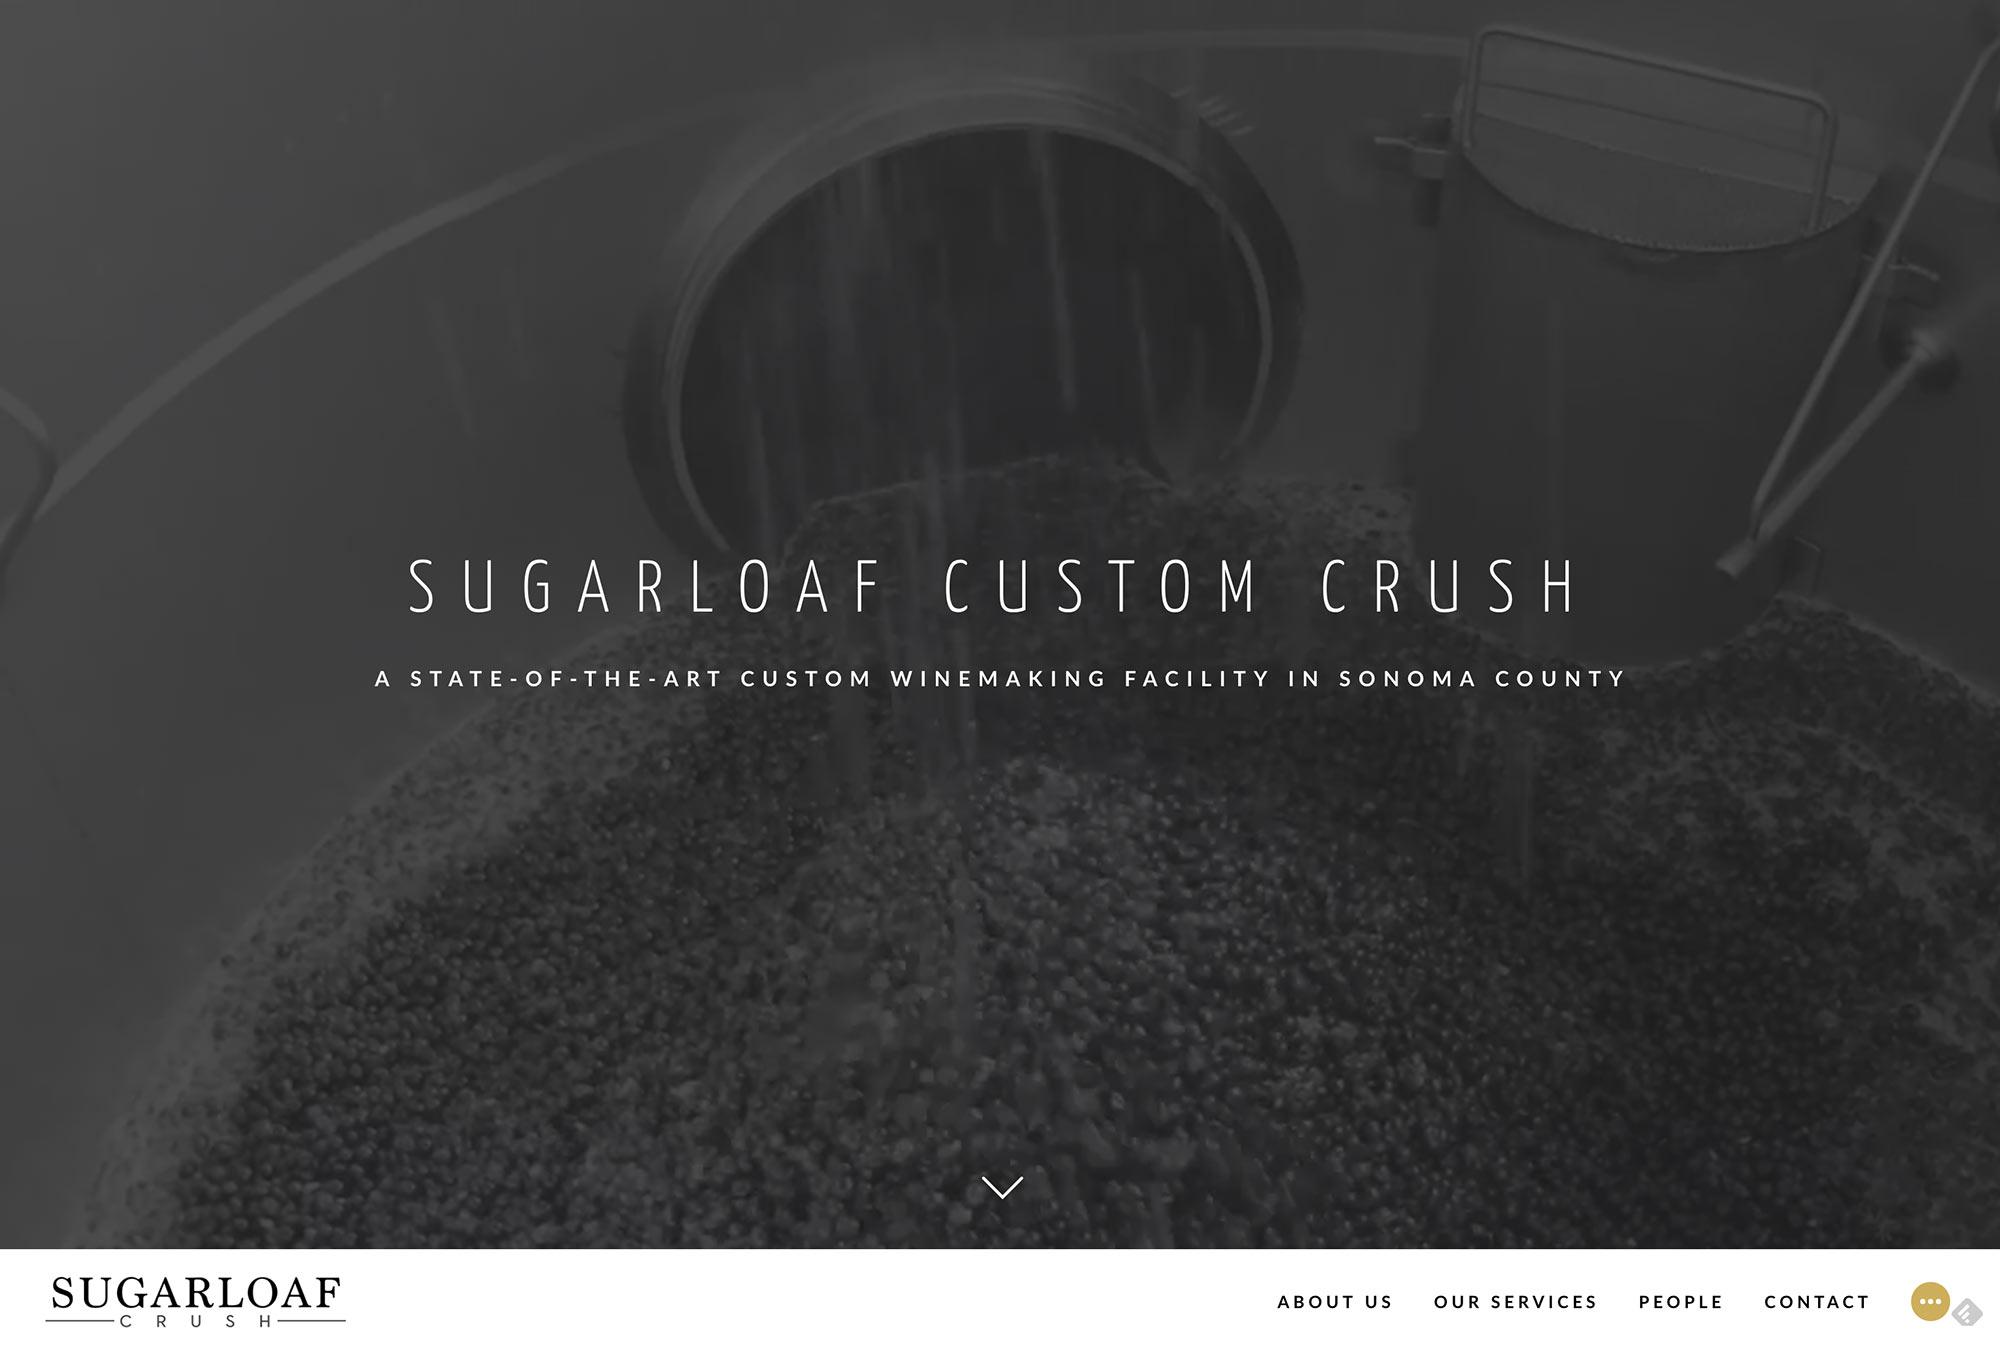 Sugarloaf | Vinbound Marketing